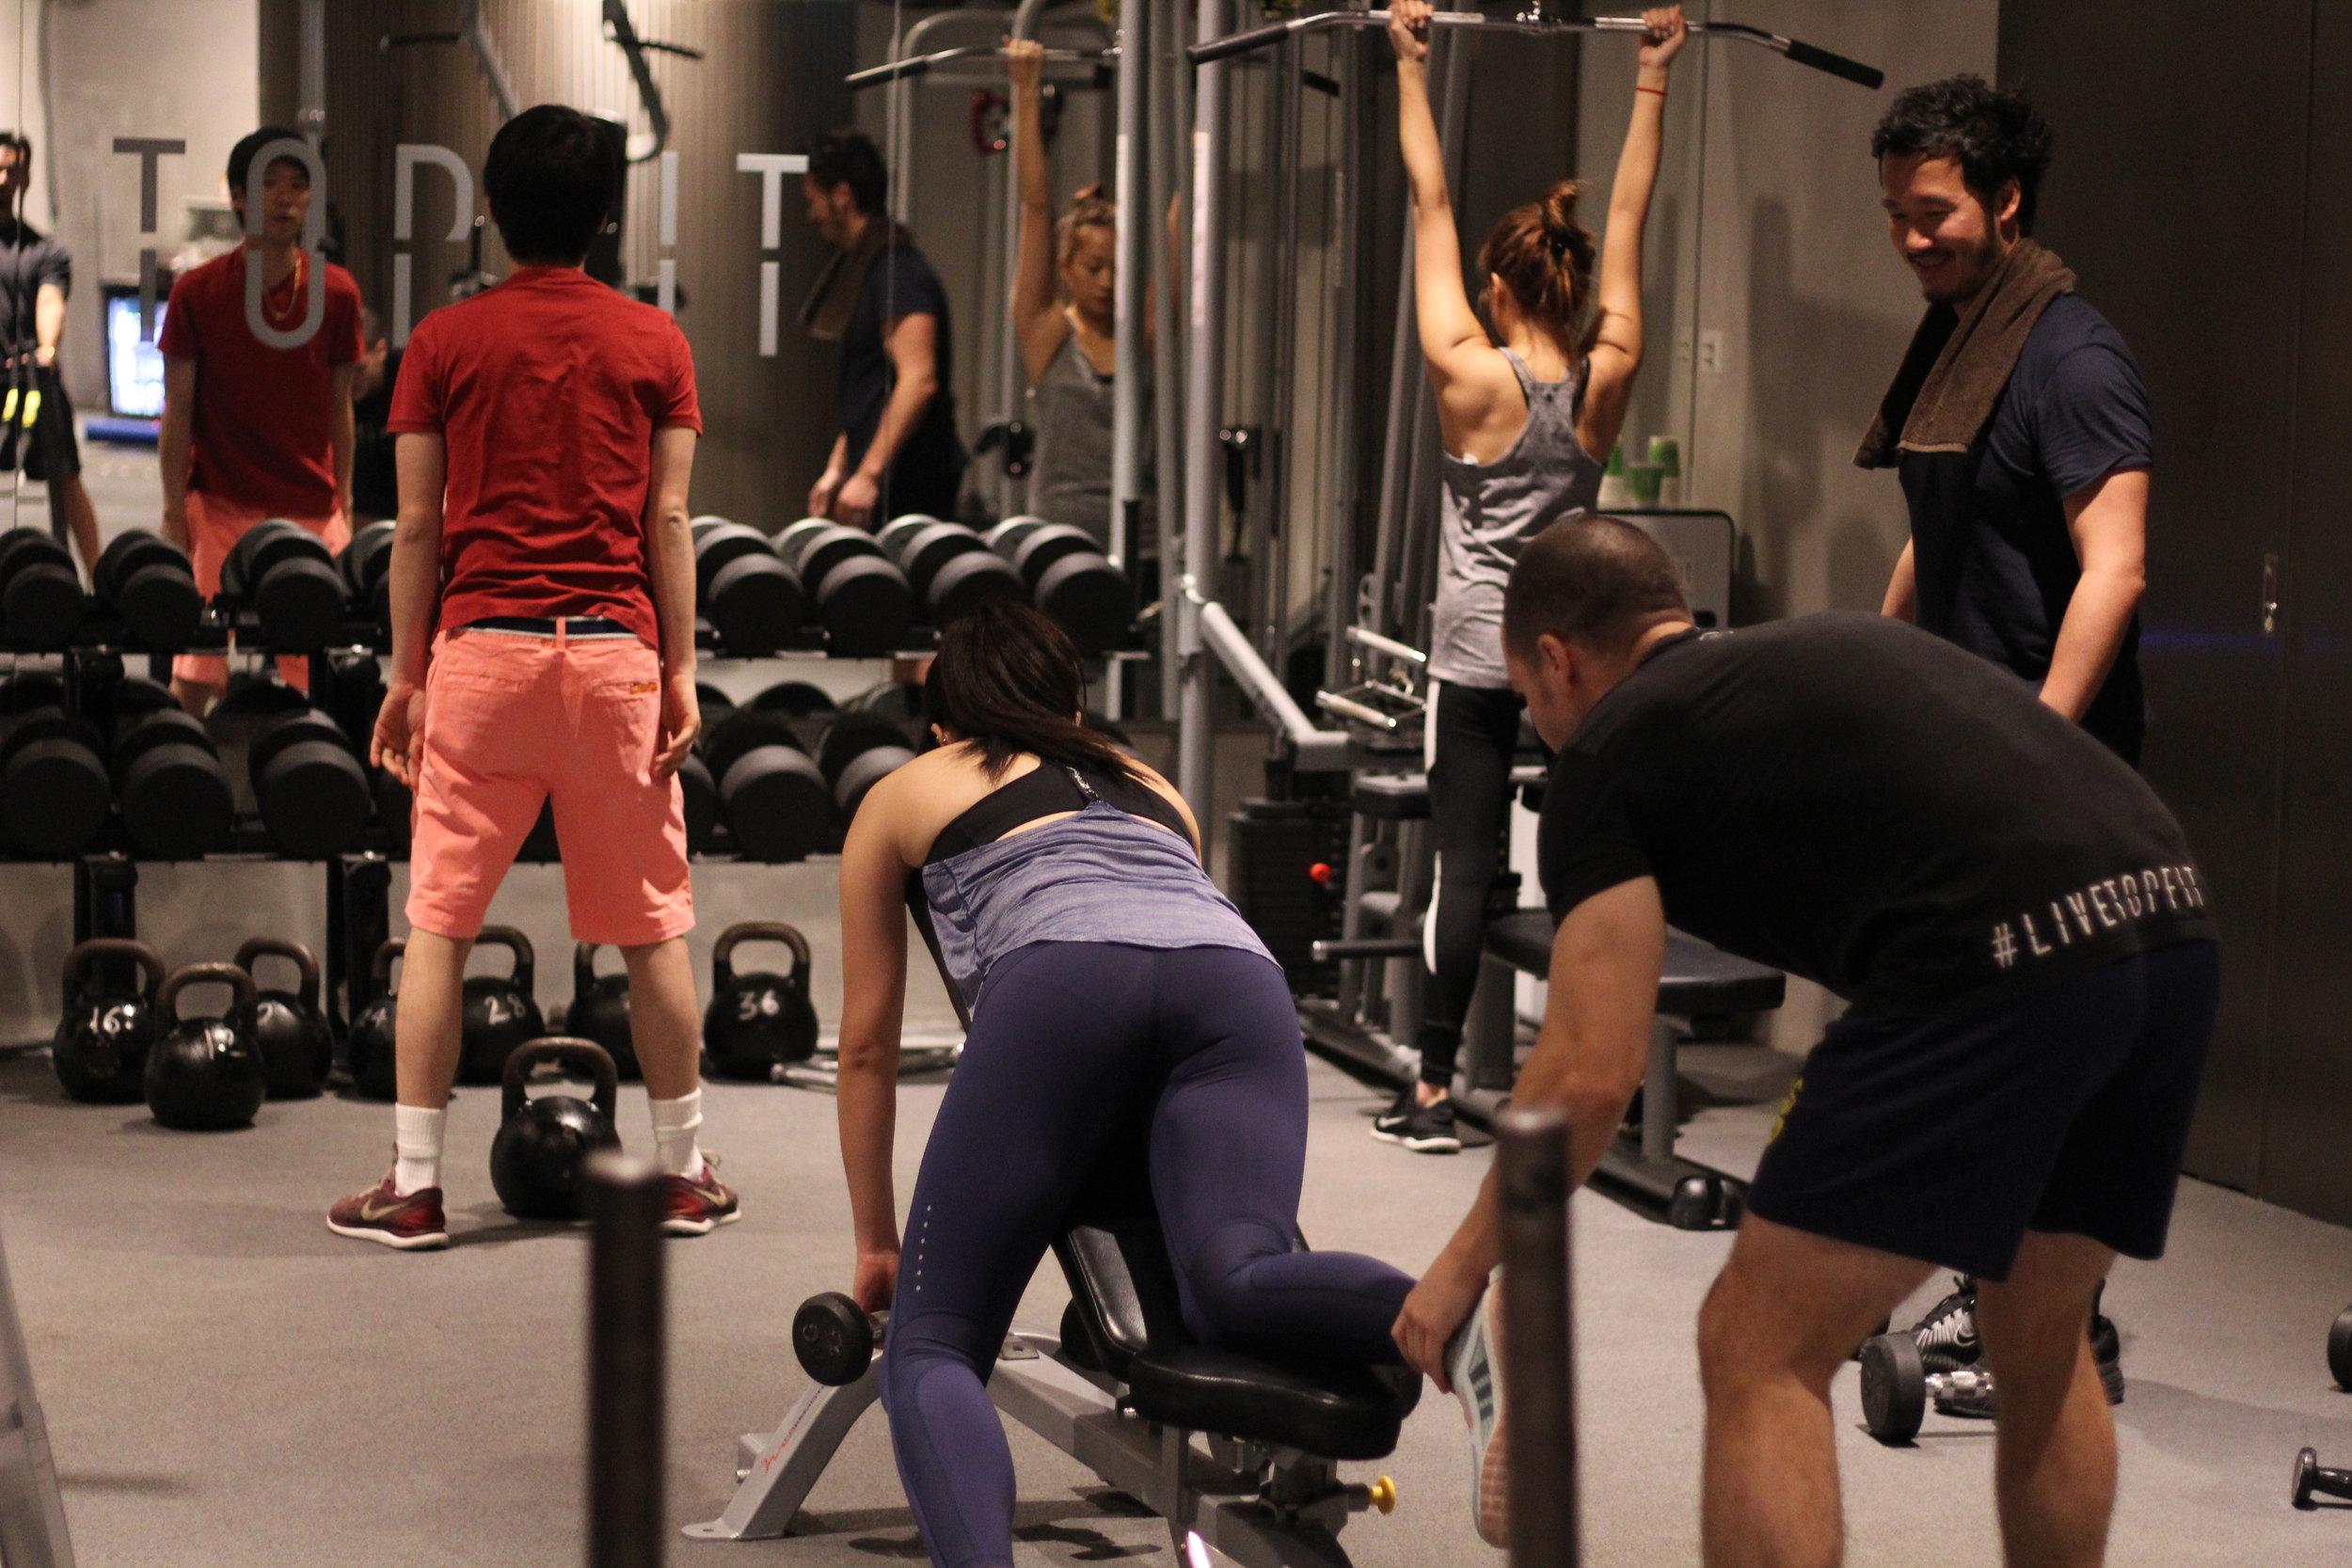 Gym Rental Equipments - TopFit Gym Hong Kong.JPG